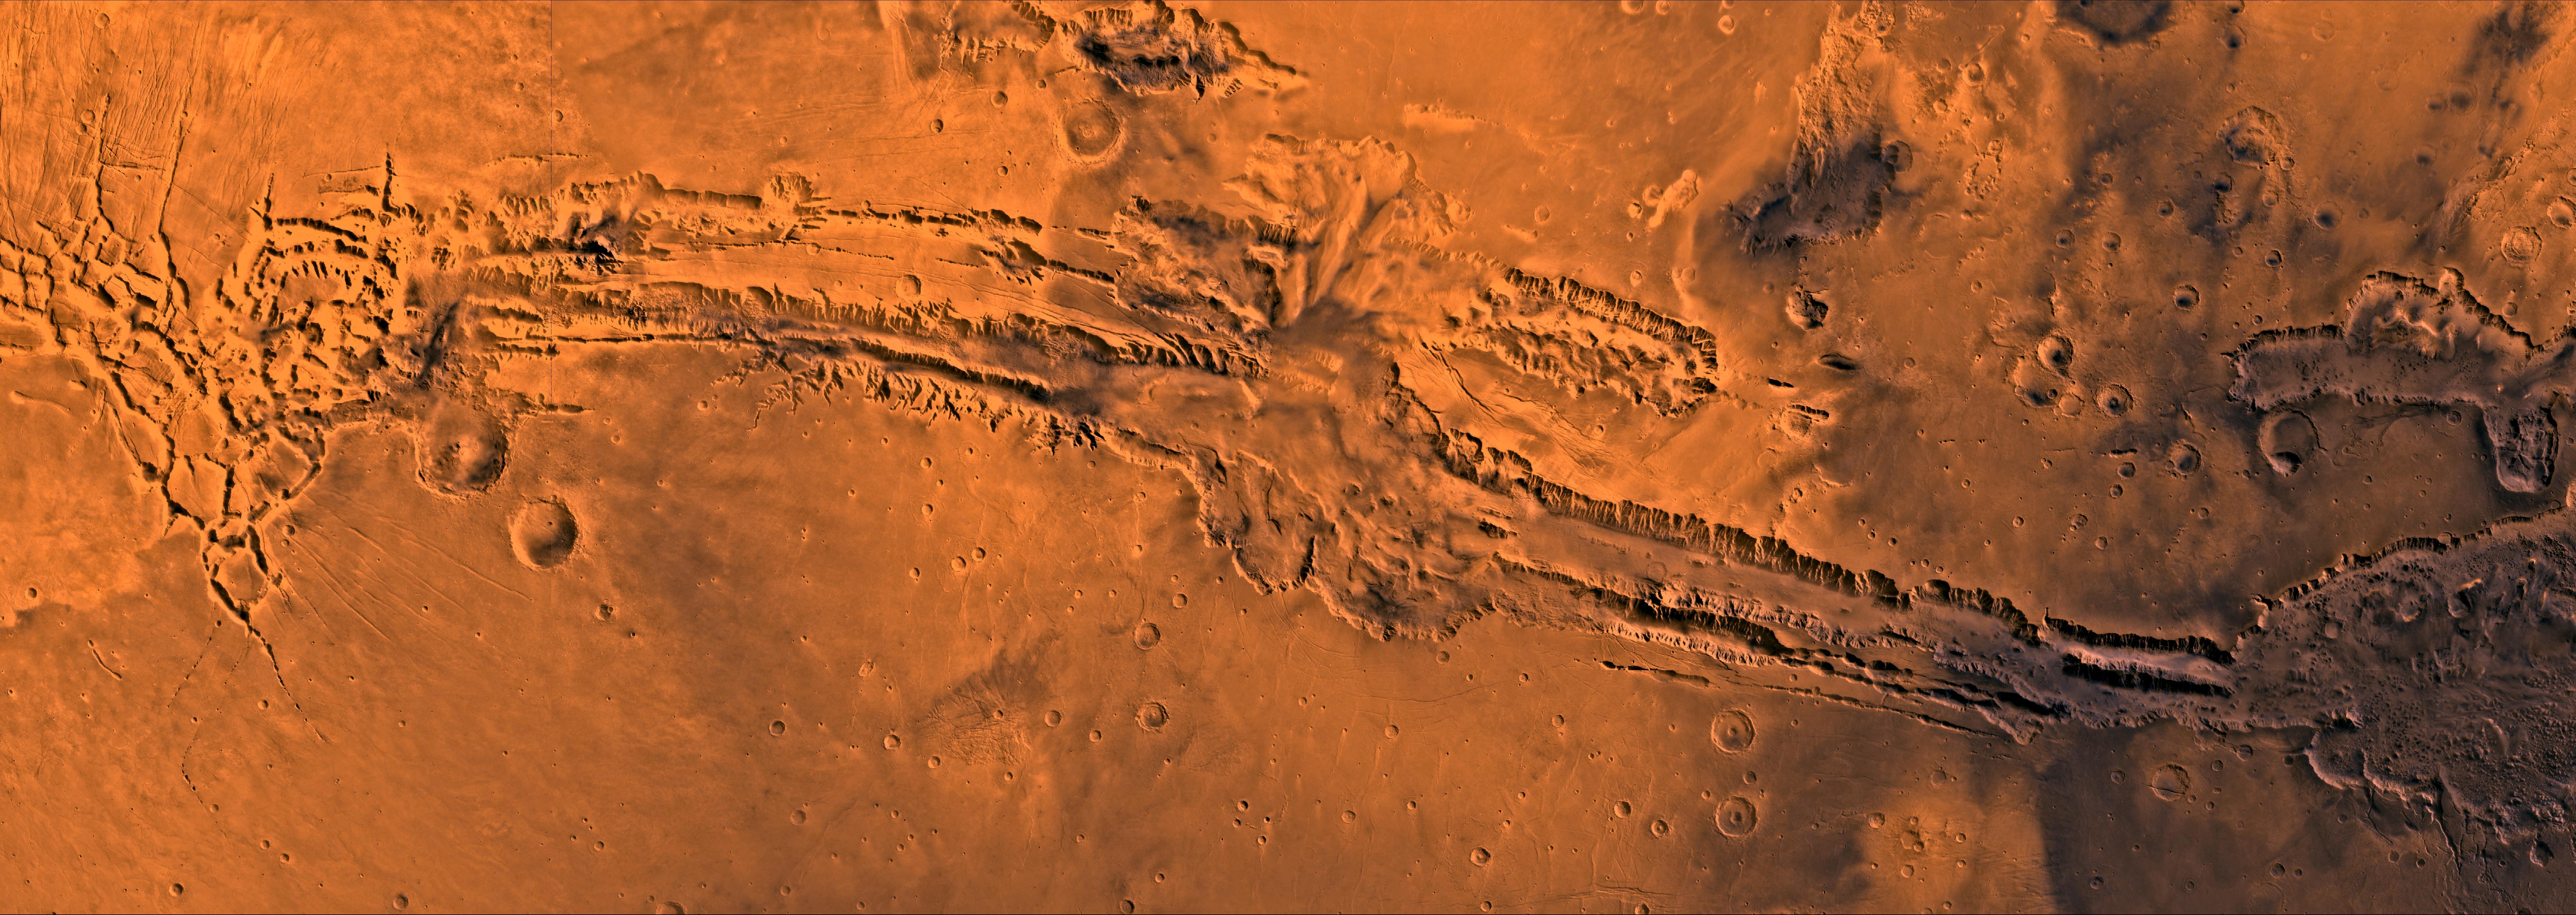 Долина маринера на марс е